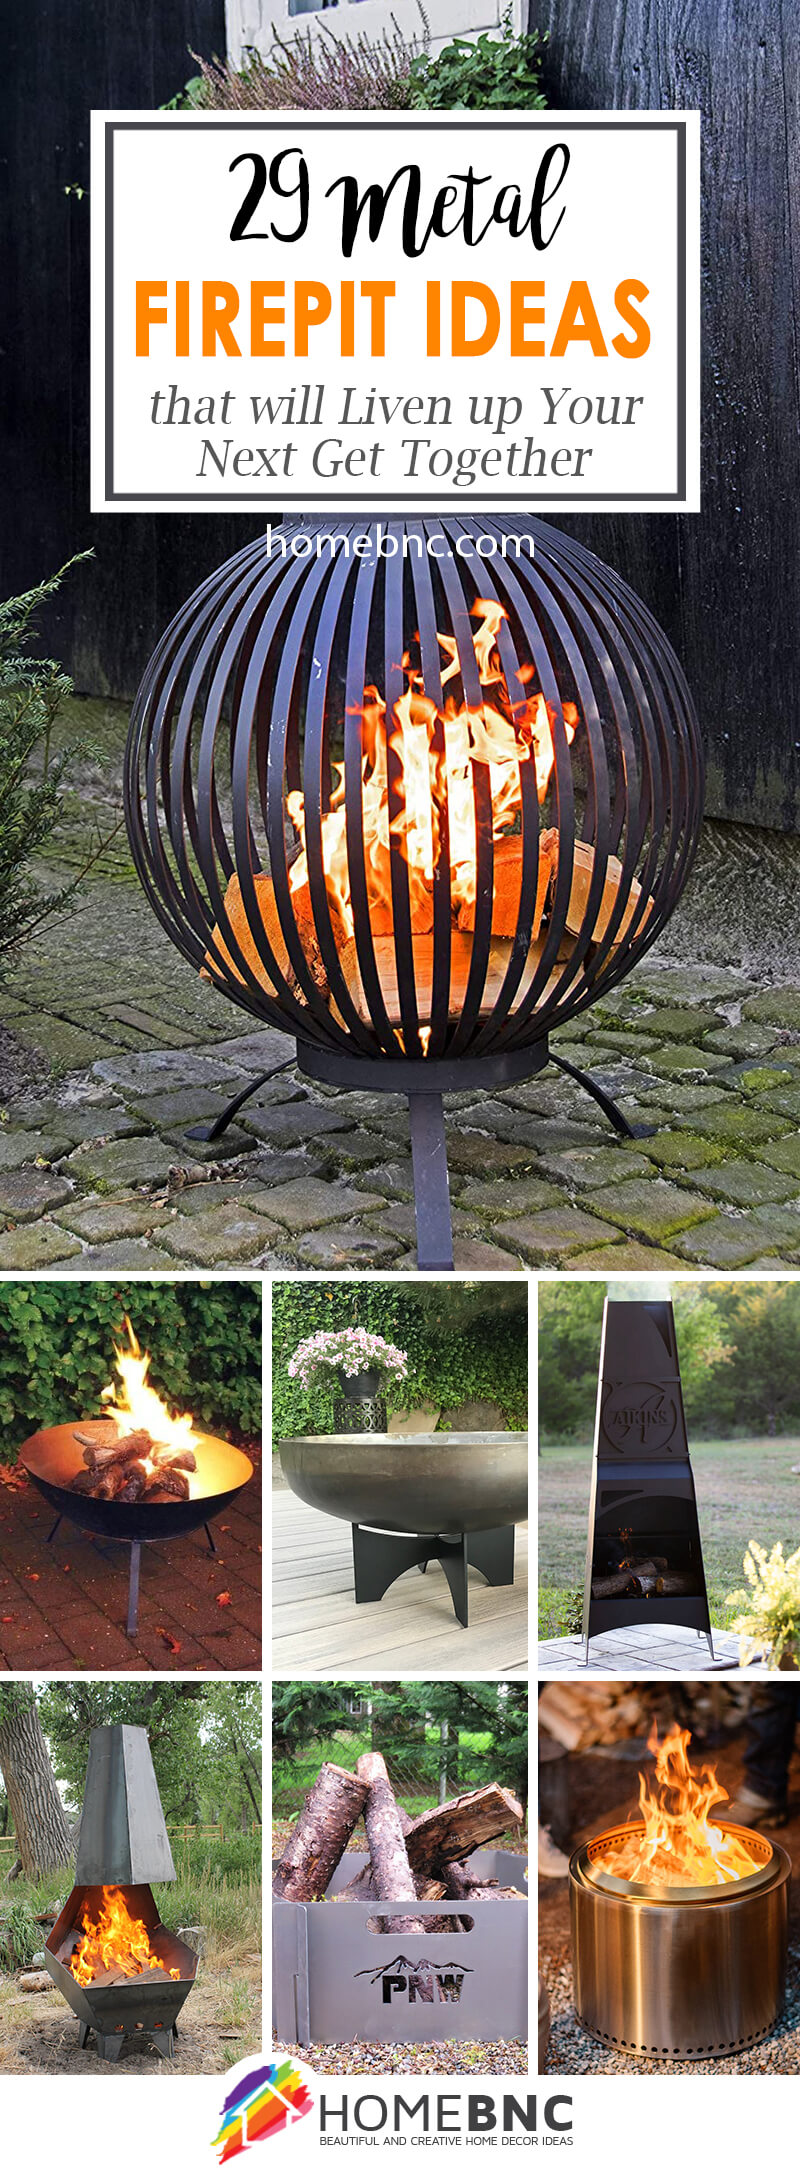 29 Best Metal Fire Pit Ideas To Modernize Your Backyard In 2020